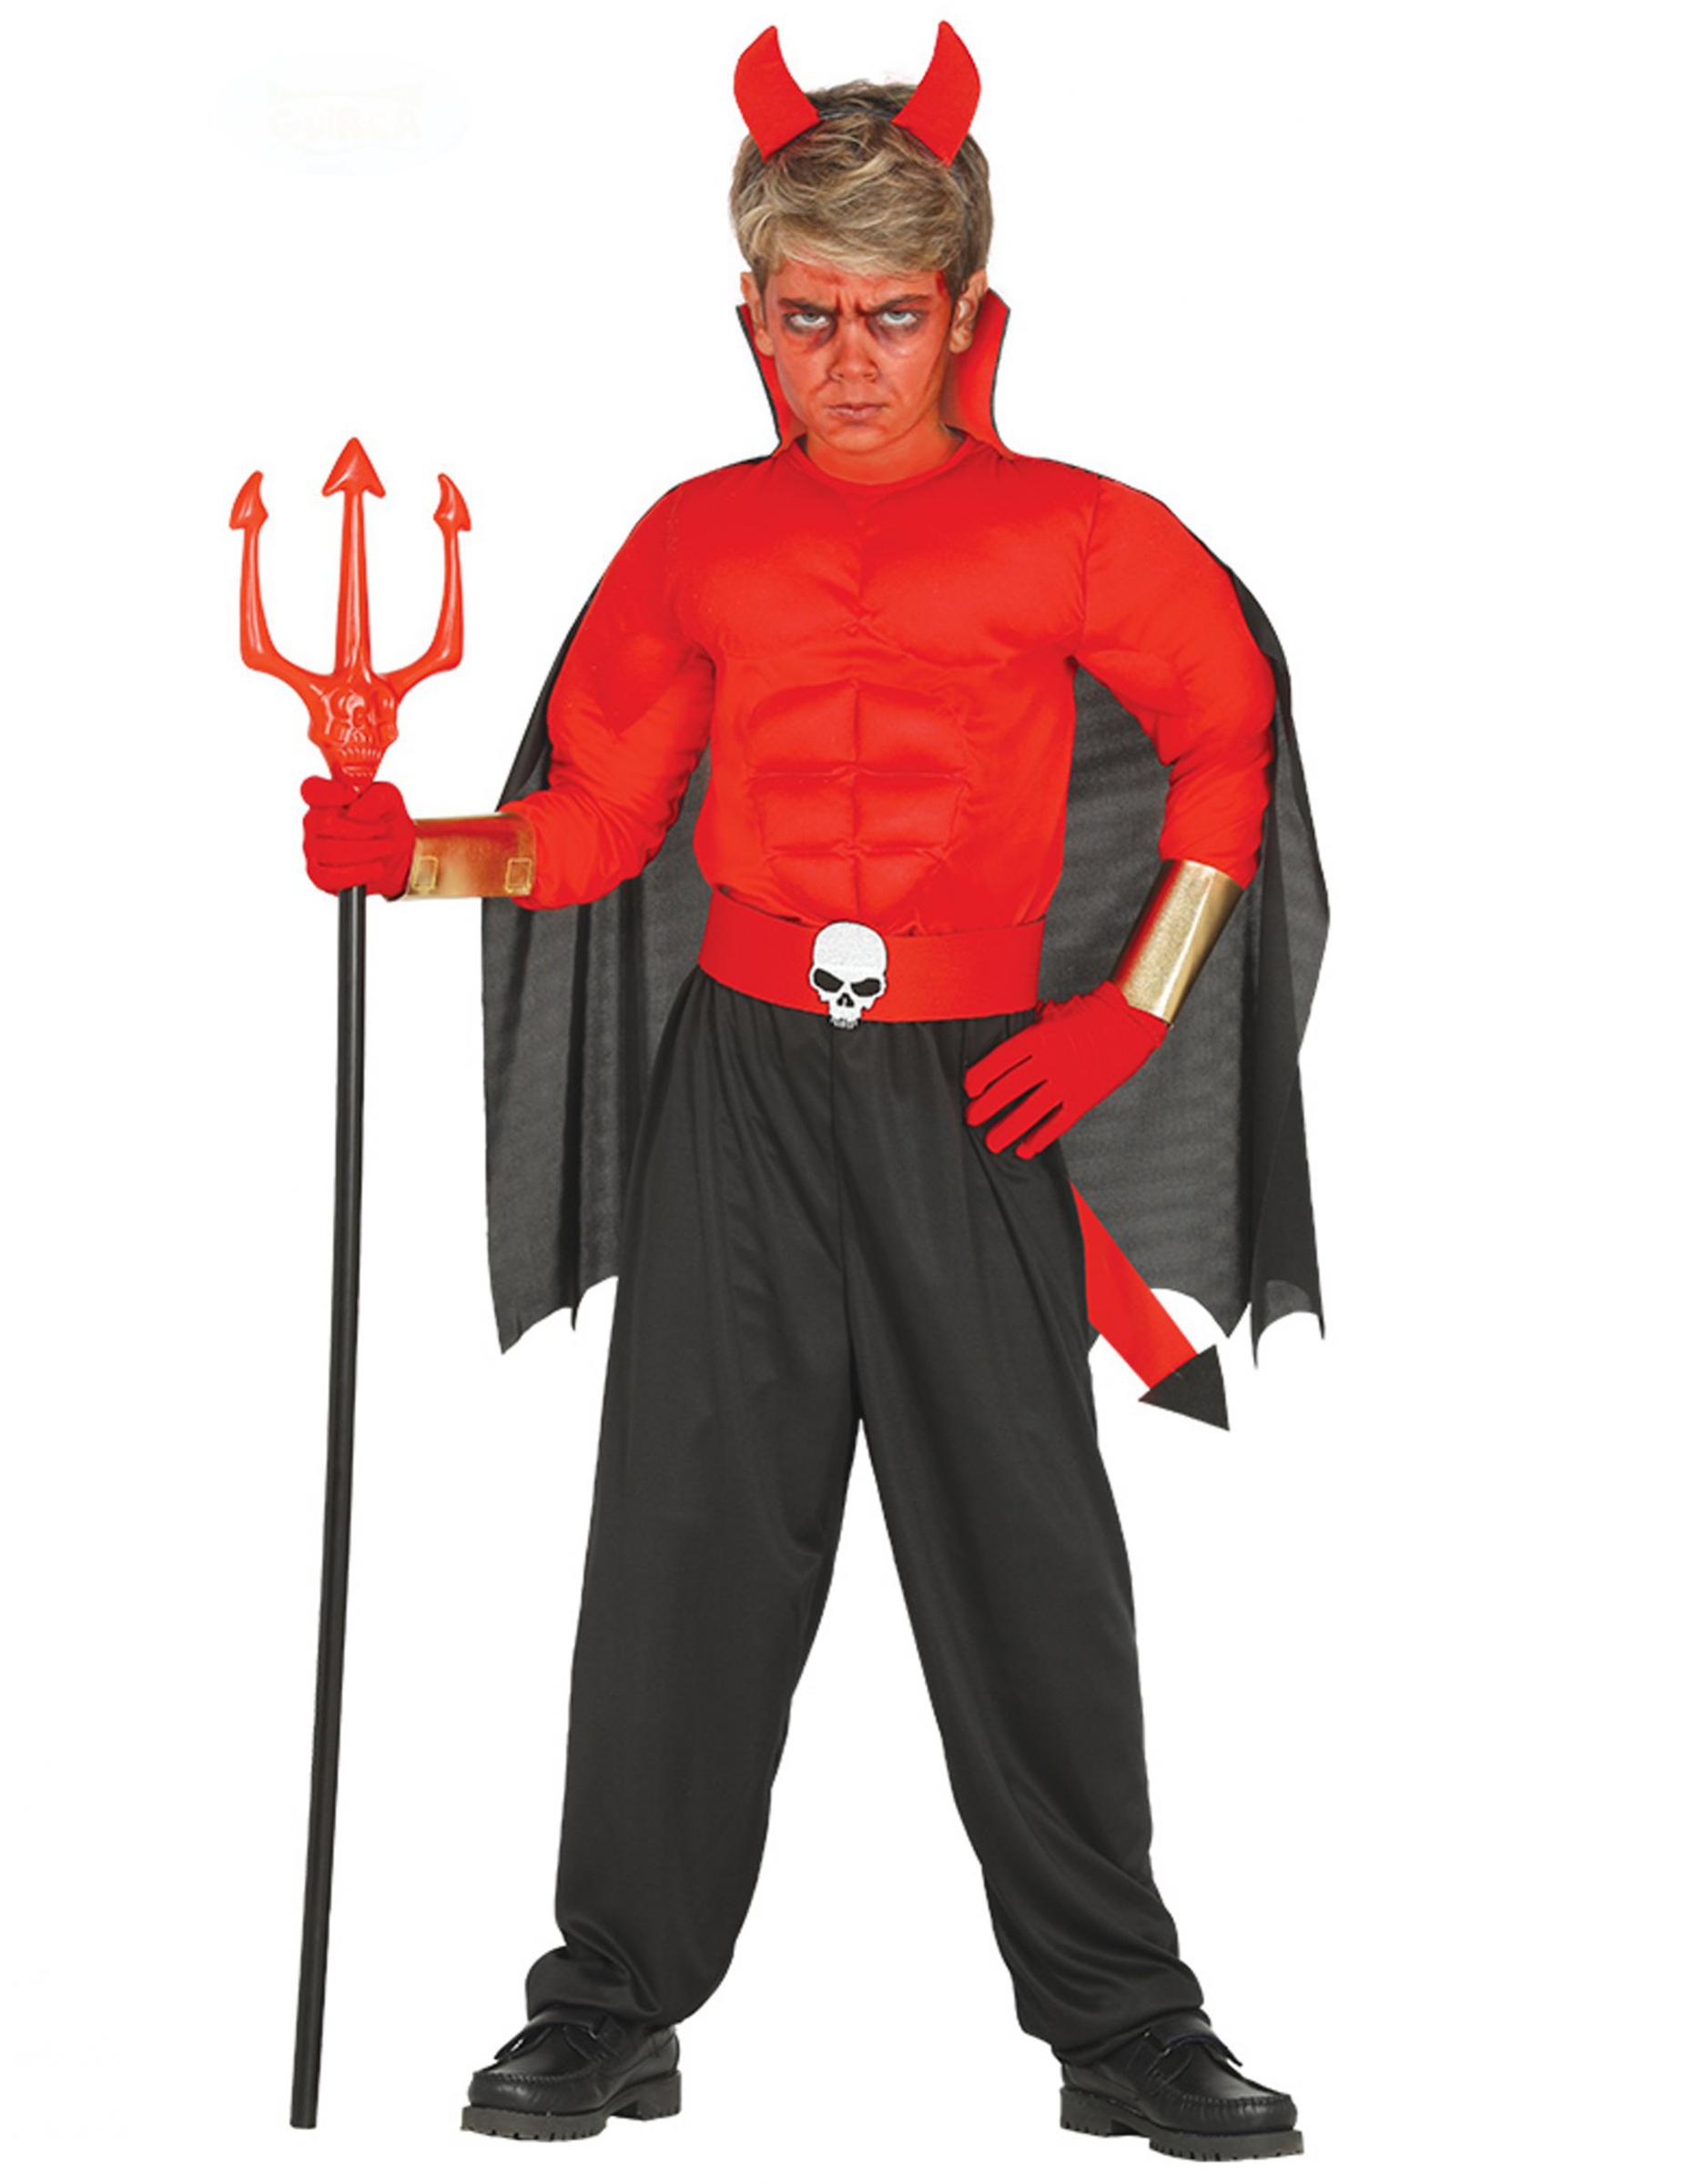 Halloween Kostume Jungs.Muskuloses Teufel Kostum Fur Jungen Halloween Kostum Rot Schwarz Gunstige Faschings Kostume Bei Karneval Megastore